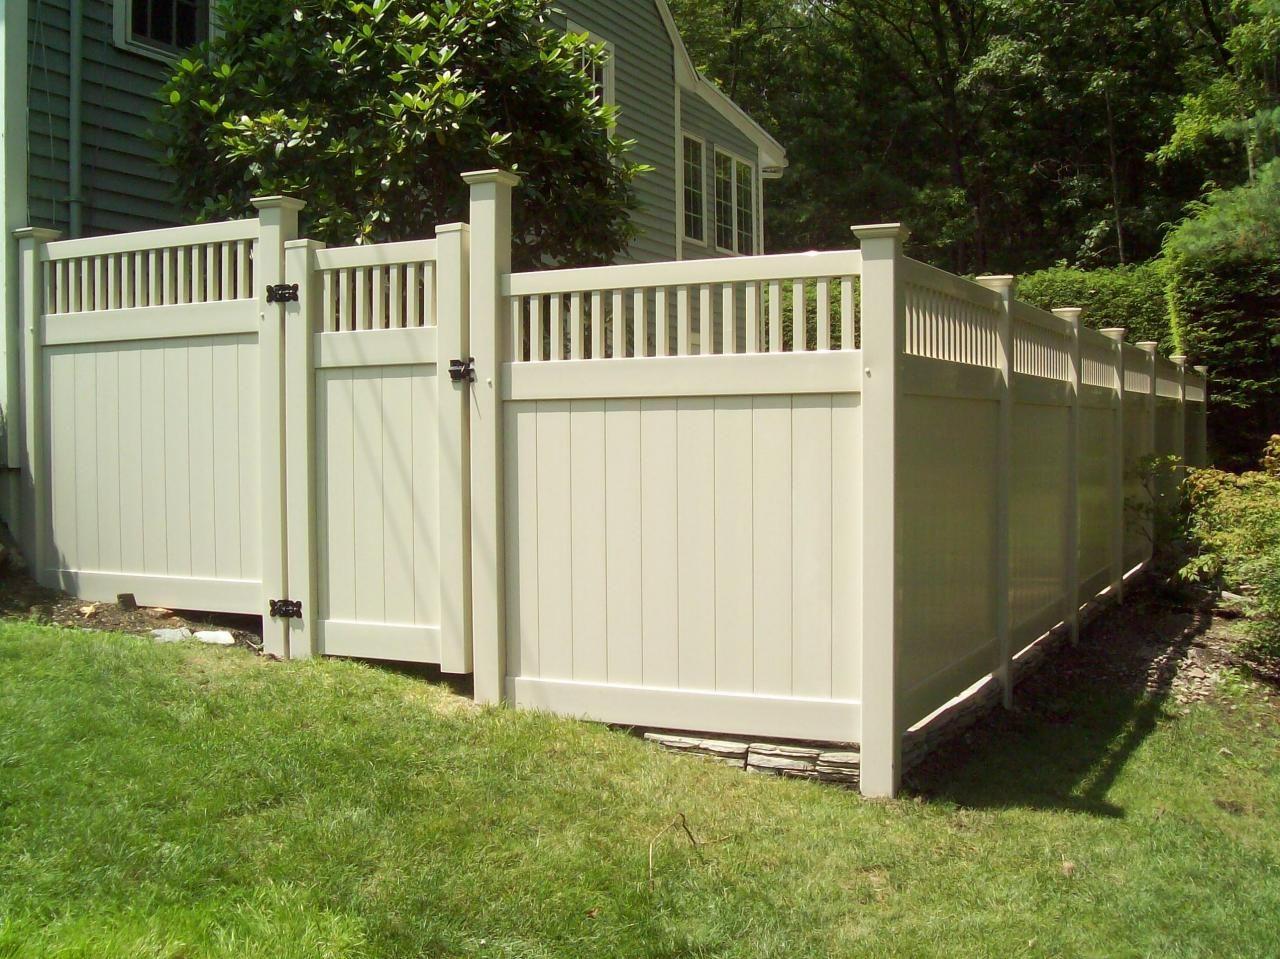 Vinyl Fencing Properties | Ask the Builder | Outside | Pinterest ...